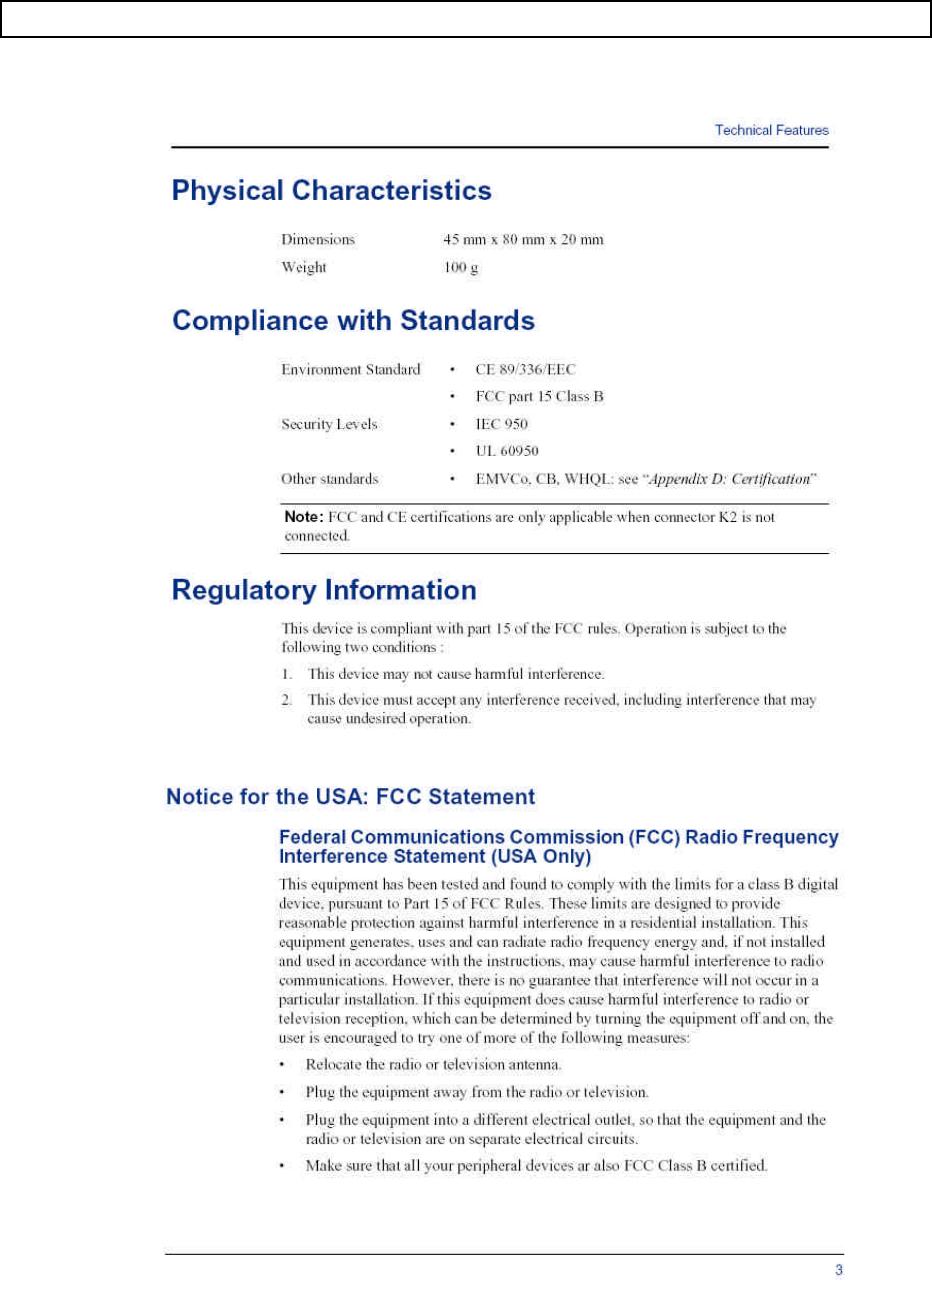 Gemalto 410EMVGC Smart Card Reader User Manual manual MES410EMVGC